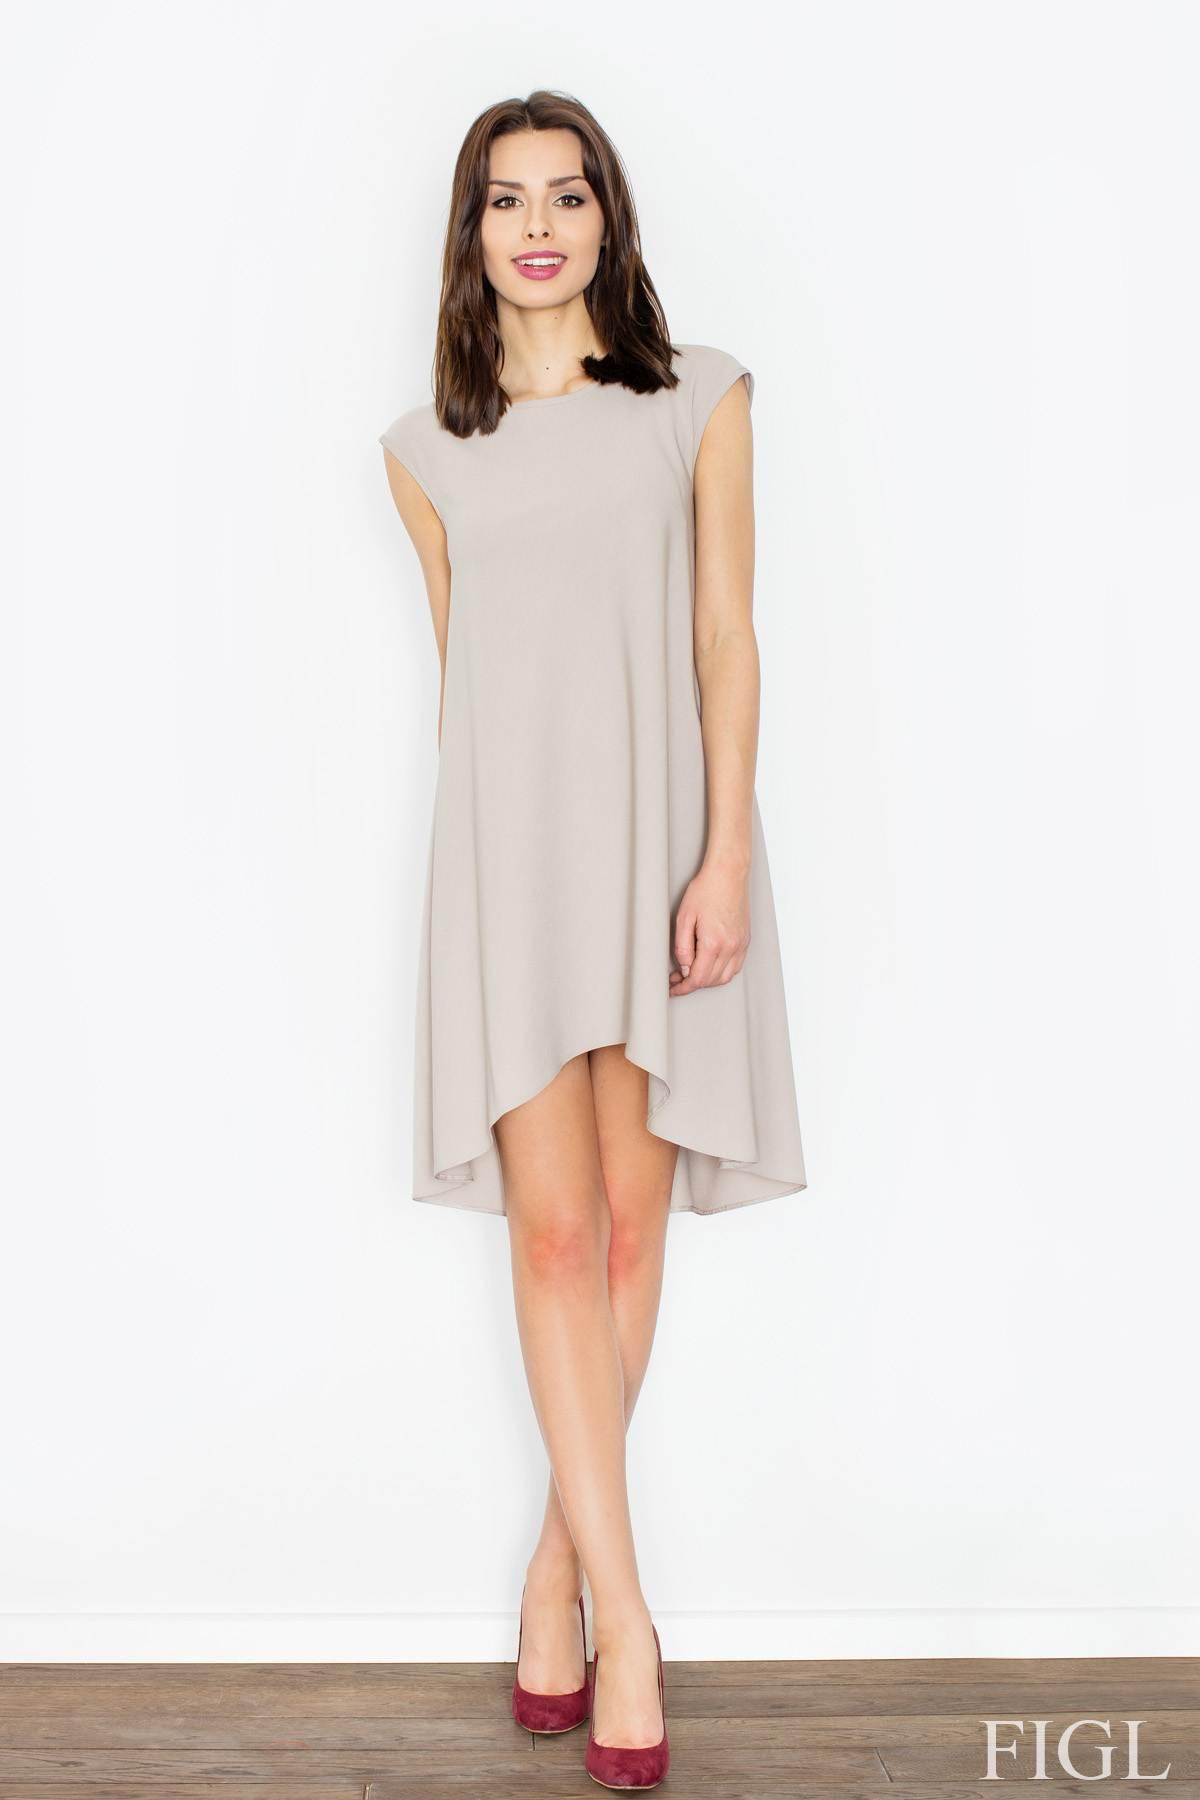 FIGL ασυμμετρο φορεμα